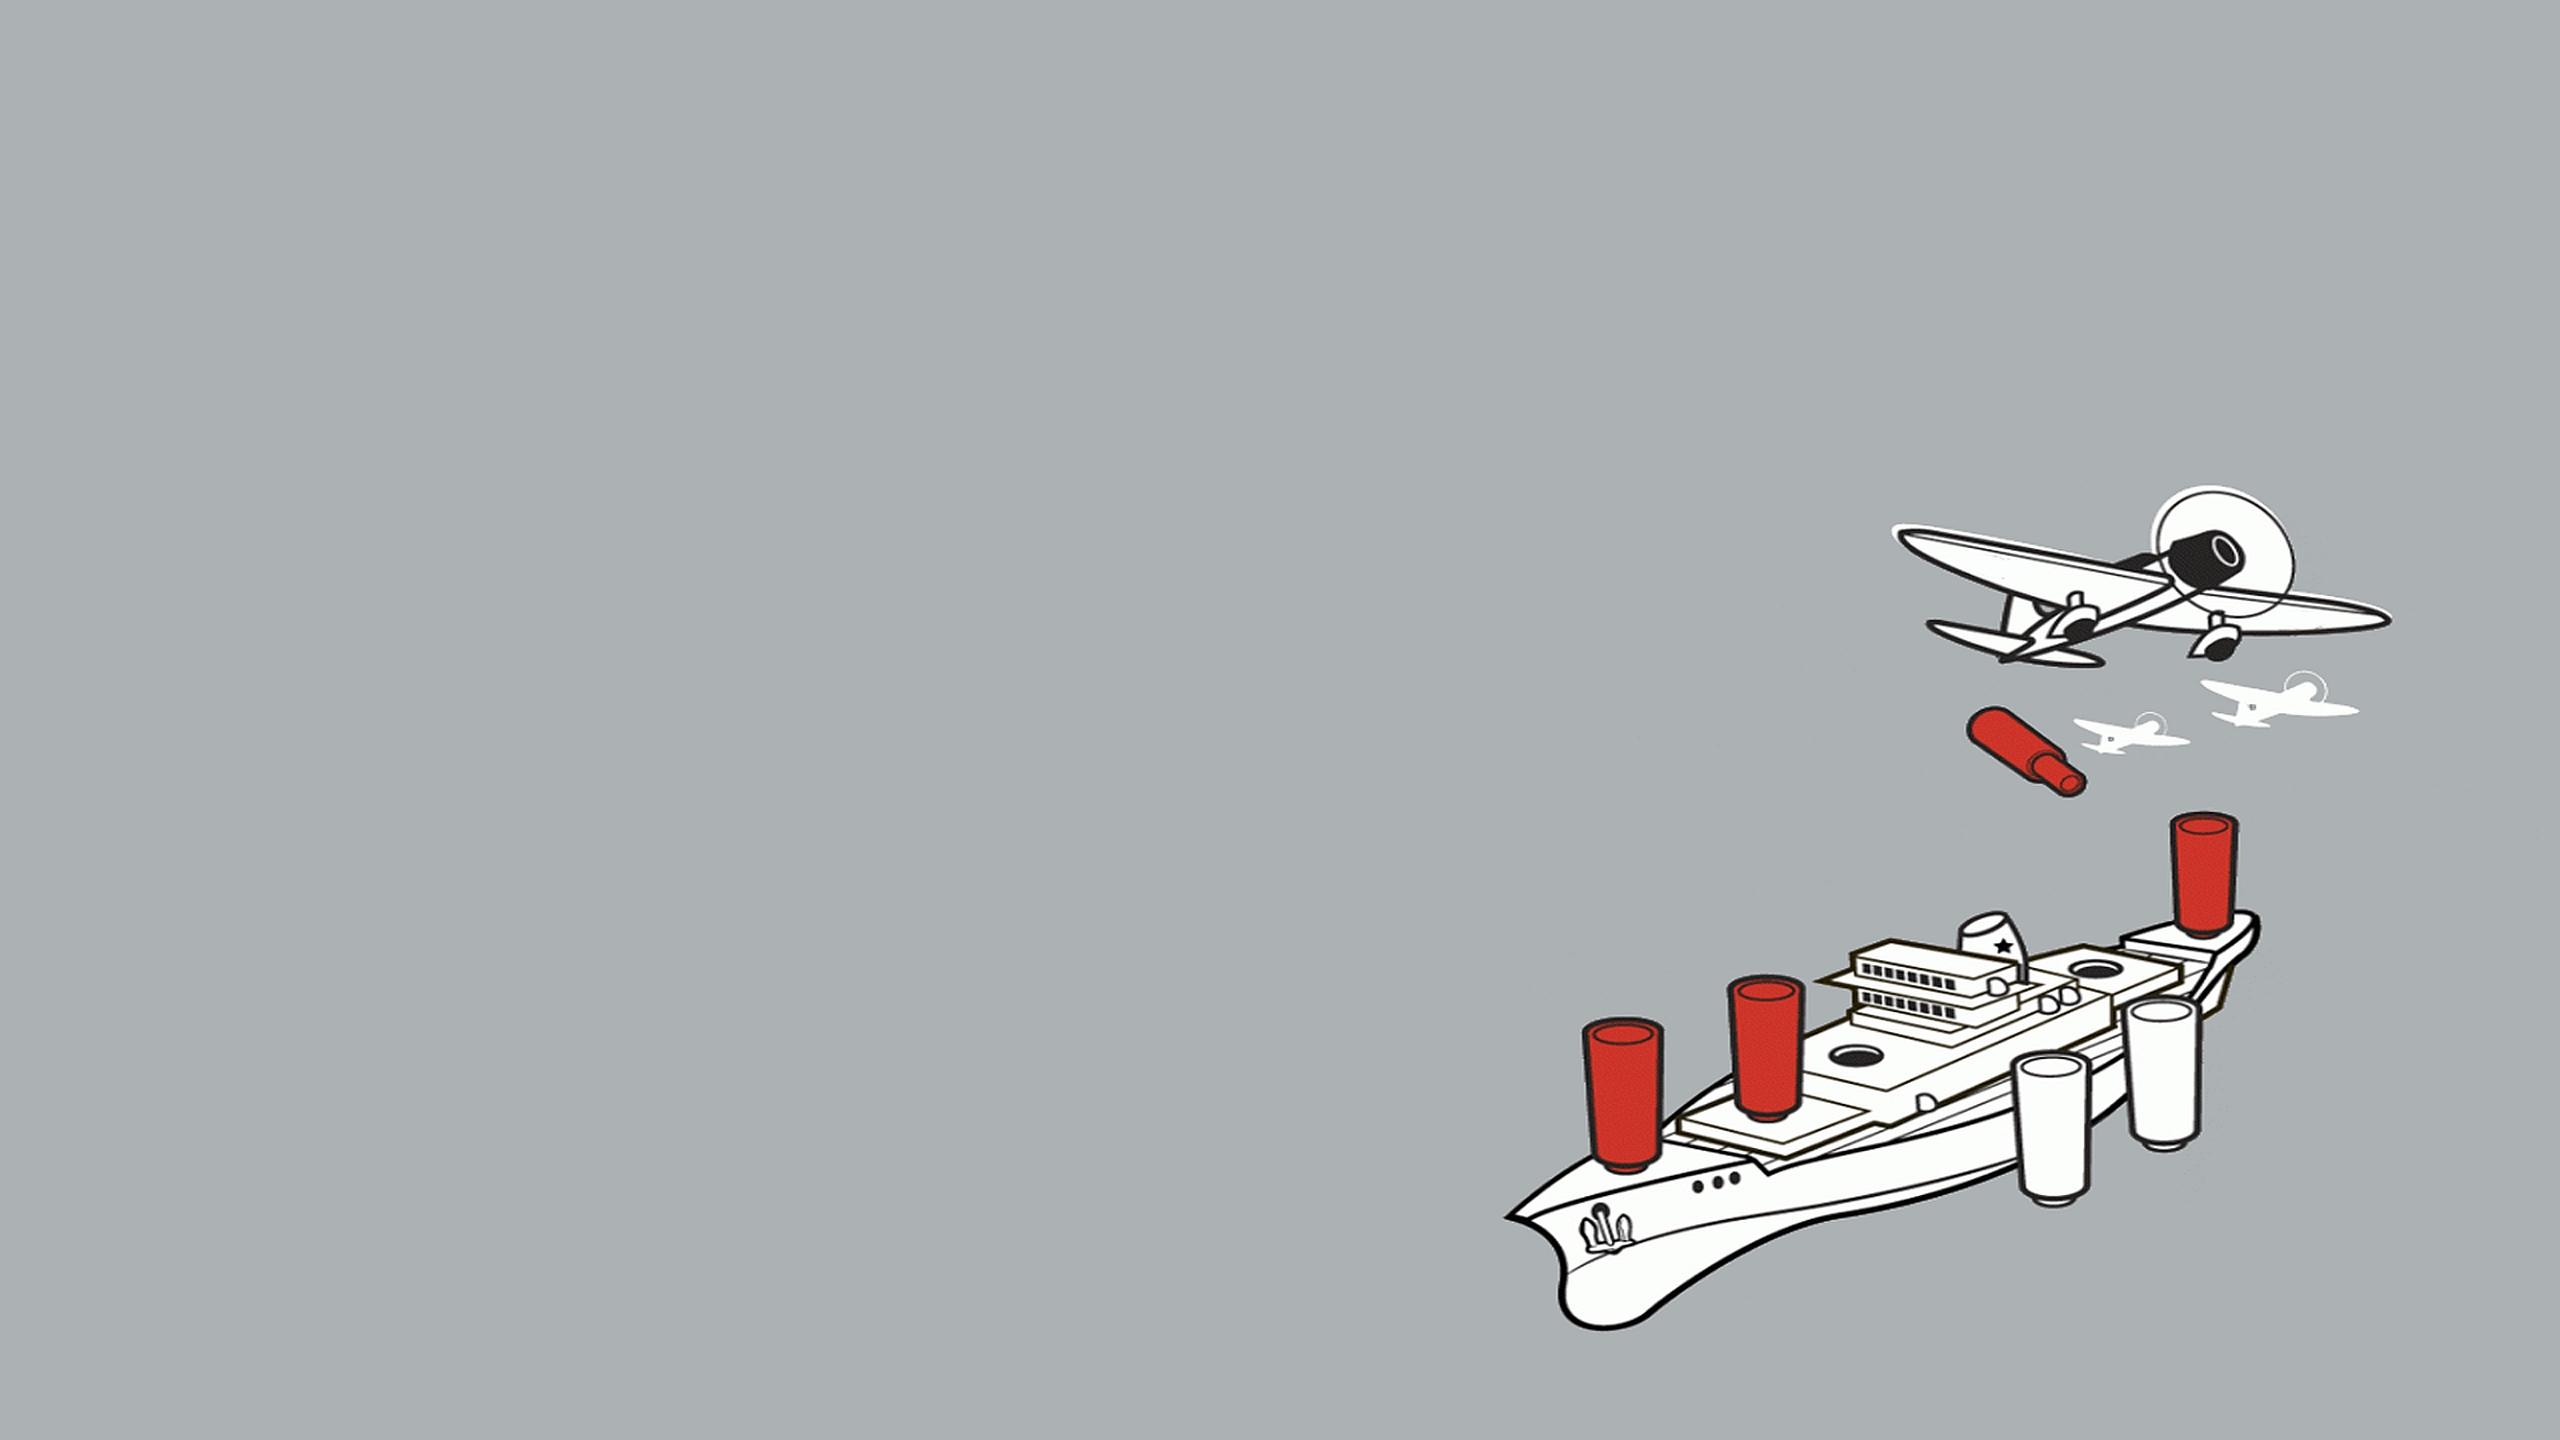 Game - Battleship  Wallpaper